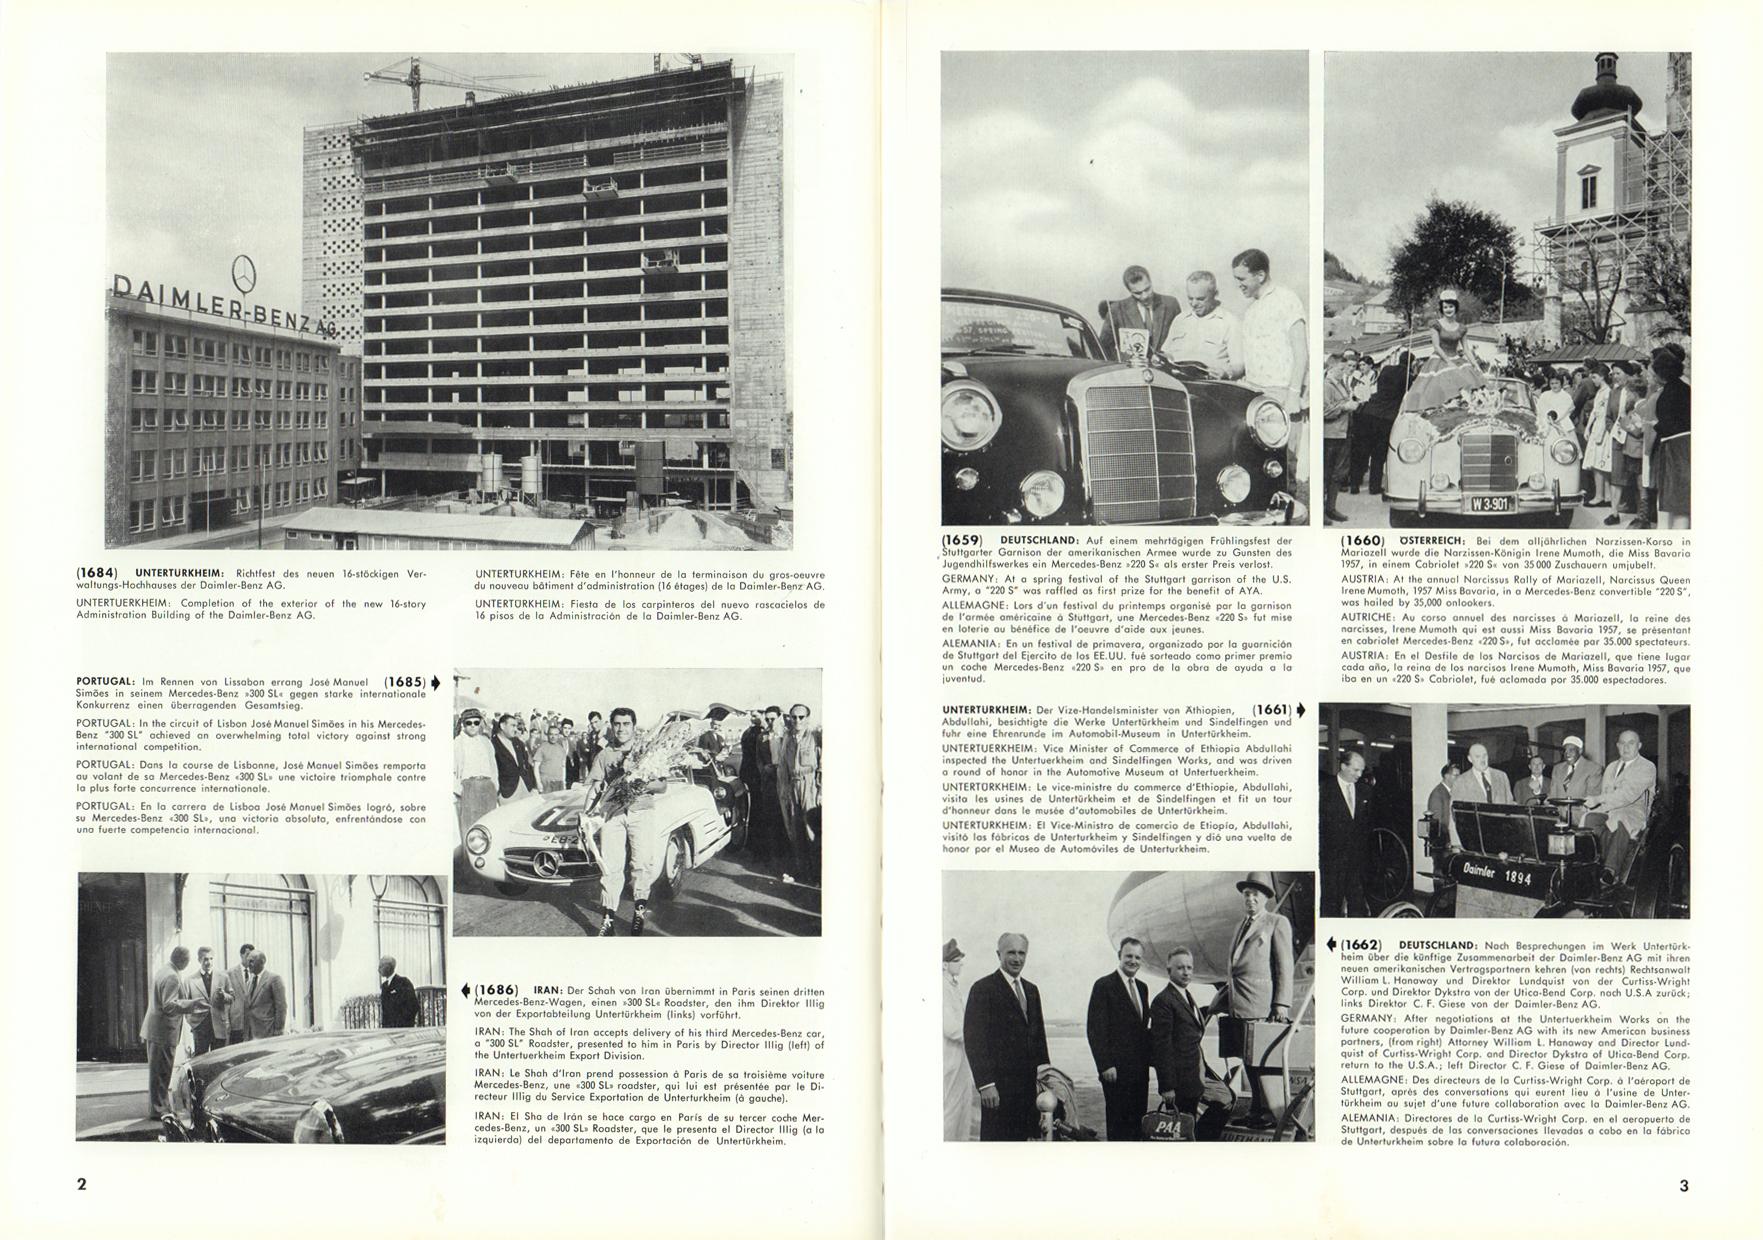 (REVISTA): Periódico In aller welt n.º 12 - Mercedes-Benz no mundo - 1957 - multilingue 002